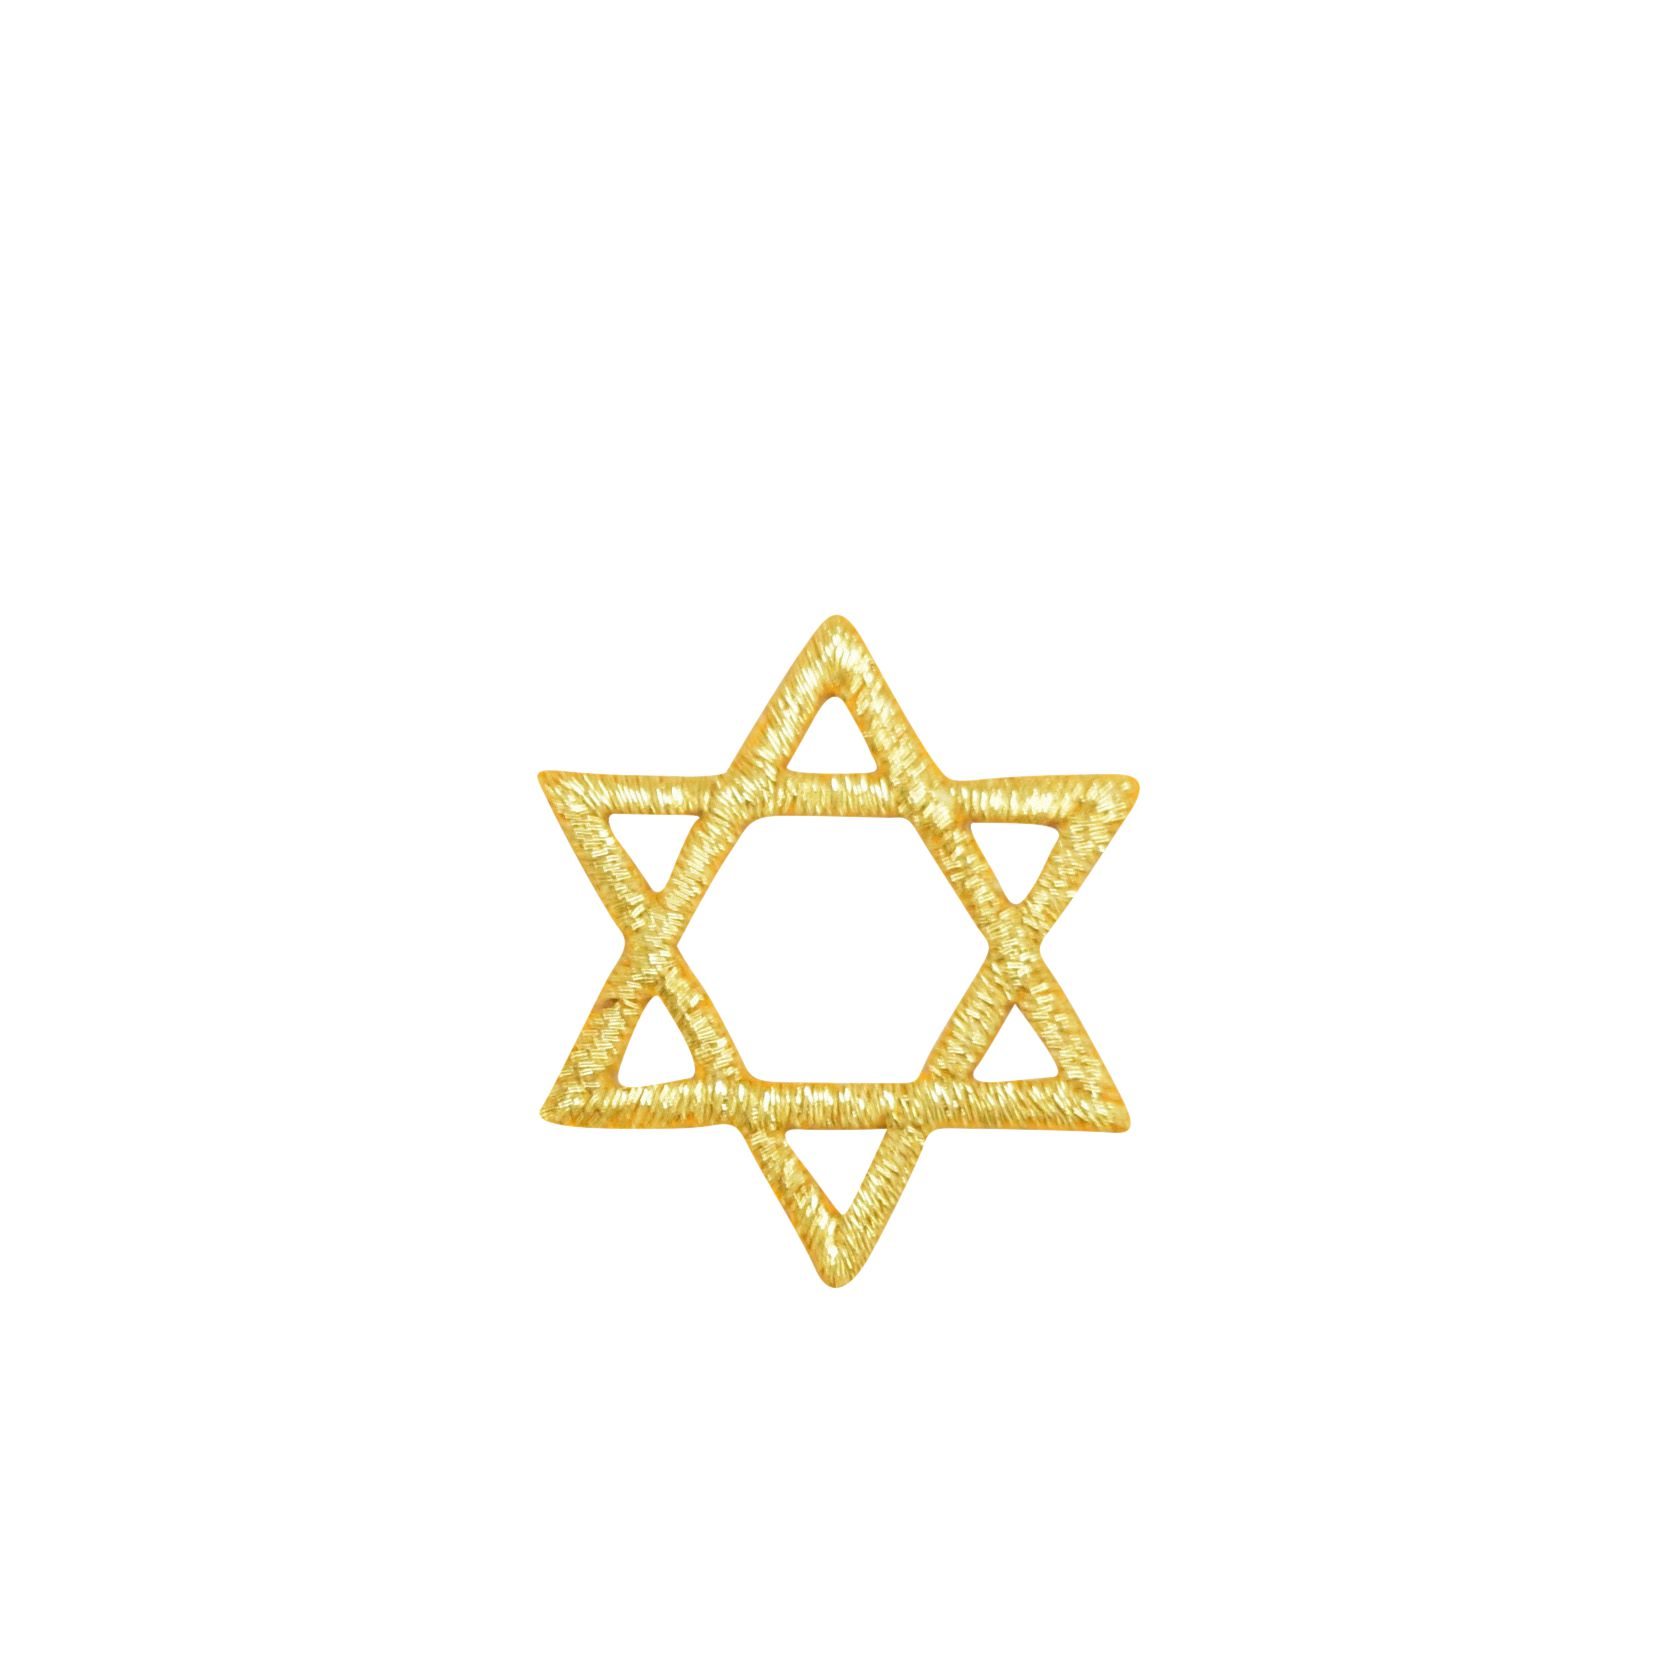 3-Pack, Mini, Iron on Blue Star of David Jewish Applique Patch